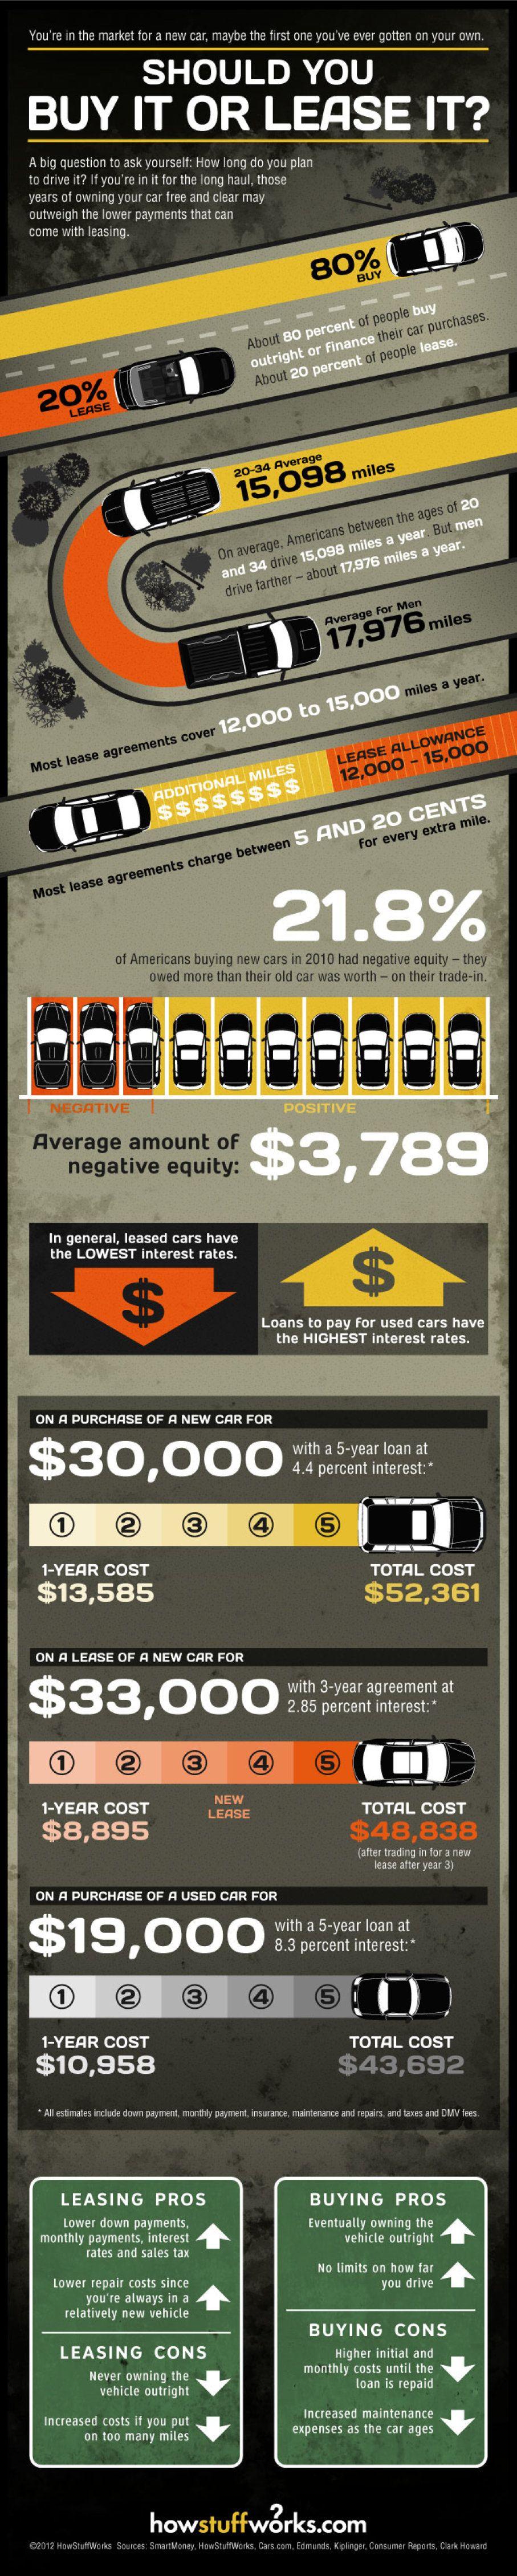 Buy Vs Lease Car Buying Car Buying Guide Car Buying Tips